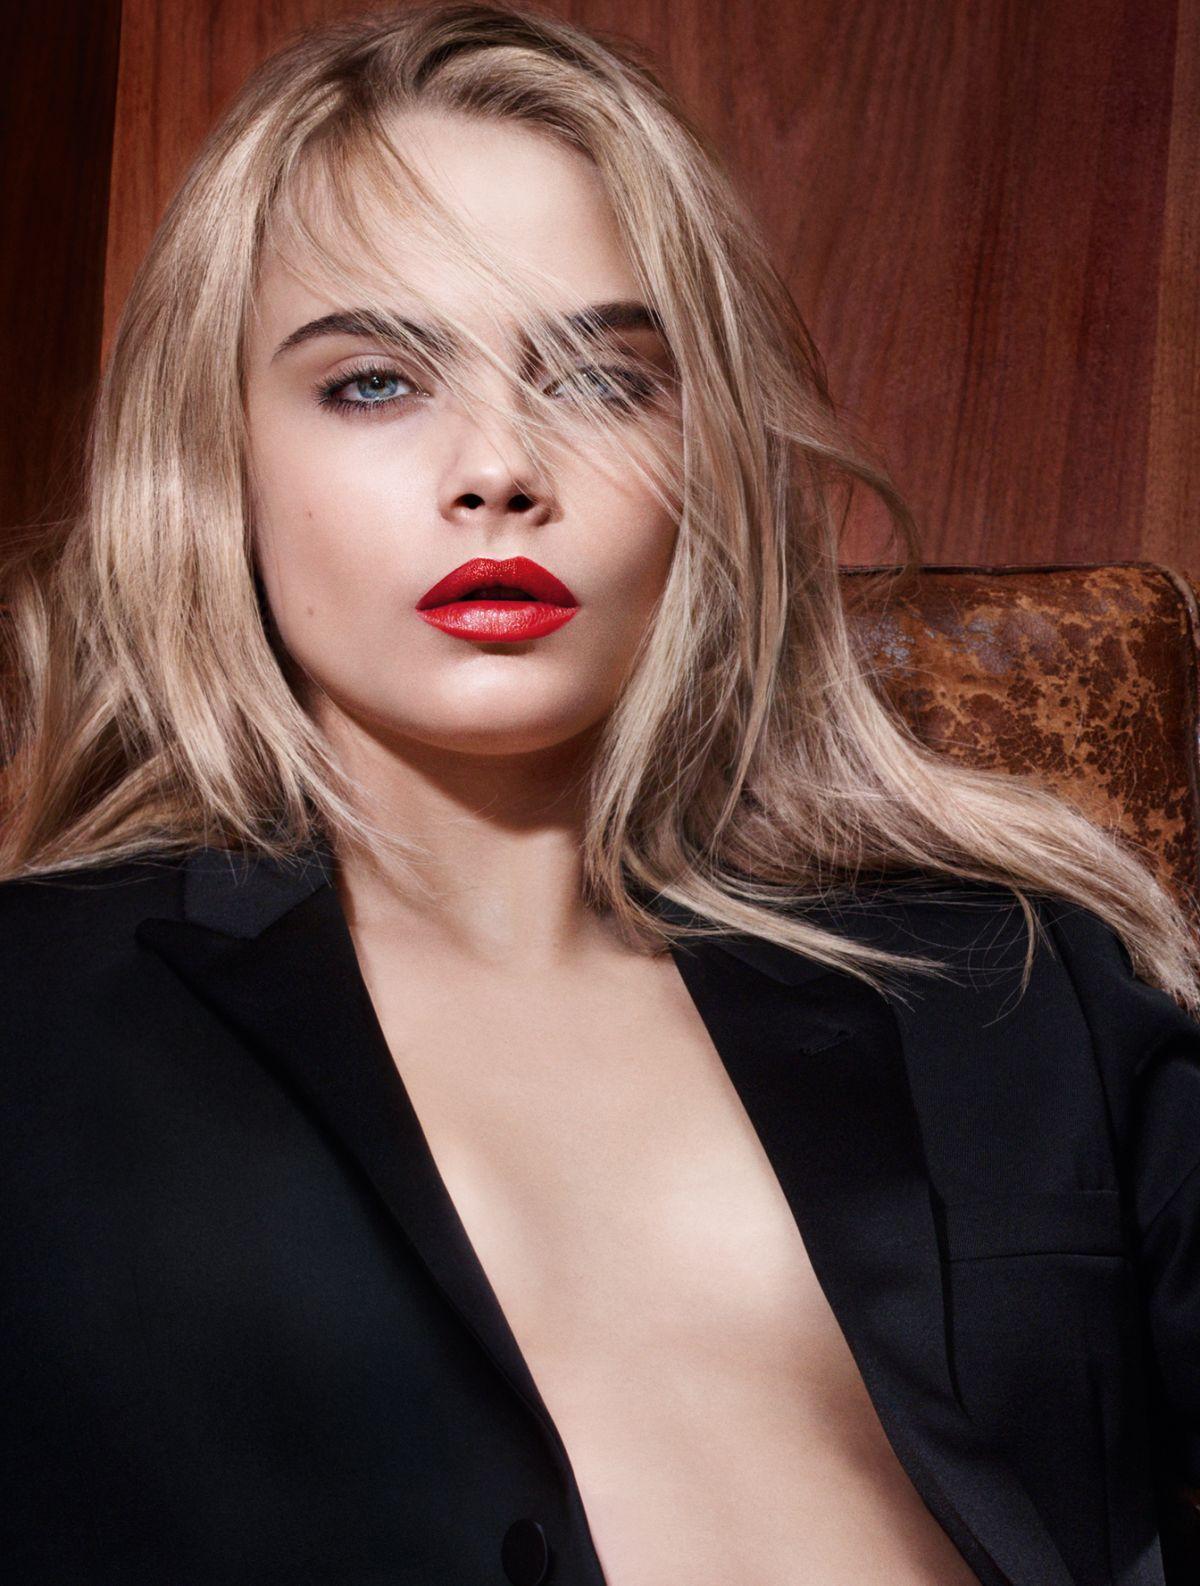 cara-delevingne-in-photoshoot-for-yves-saint-laurent-lipsticks_1 ...